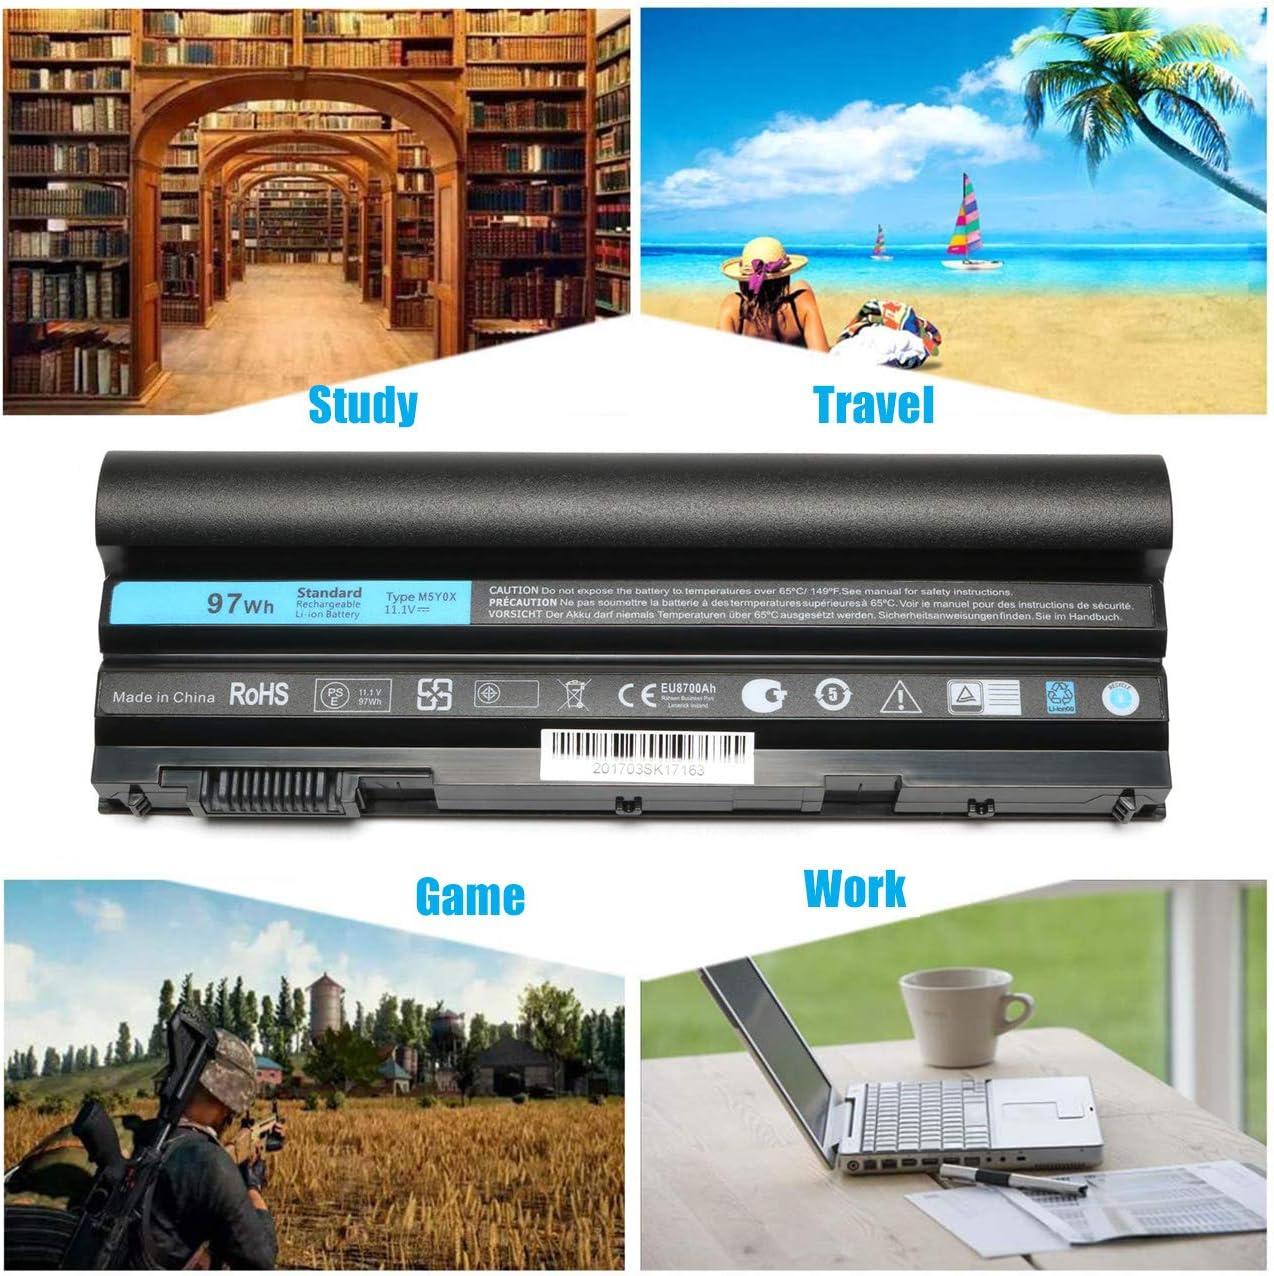 B01M3T5DL7 New 97Wh Latitude E5420 E6420 Laptop Battery for Dell E5520 E5530 E6520 Compatible P/N: M5Y0X T54FJ 2P2MJ 312-1325 312-1165 PRV1Y-12 Months Warranty 71OrtAyT7tL